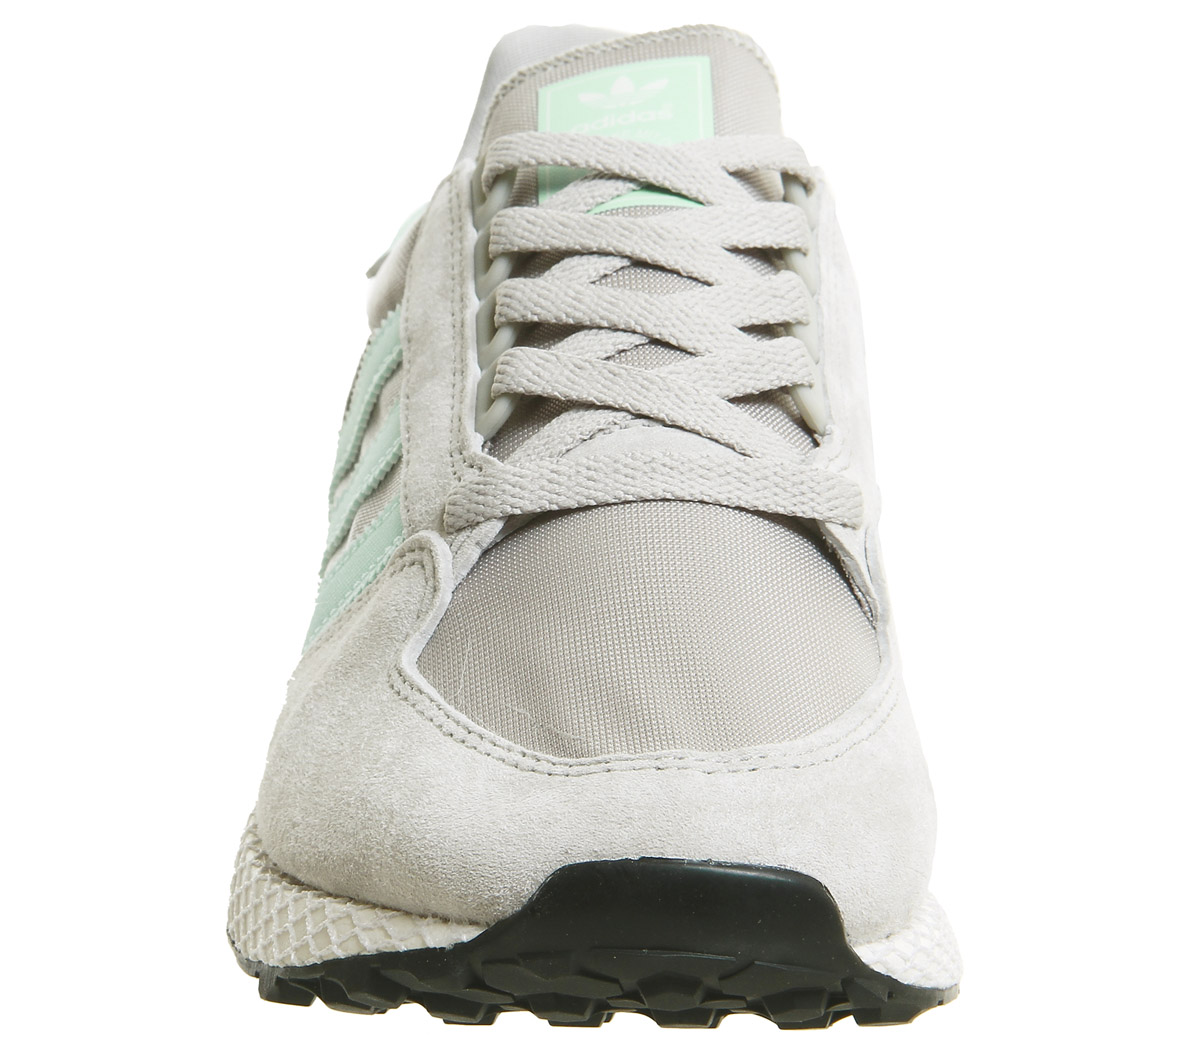 best service 66e72 edf7c SENTINEL Womens Adidas Forest Grove formatori sesamo nero scarpe da  ginnastica scarpe bianco